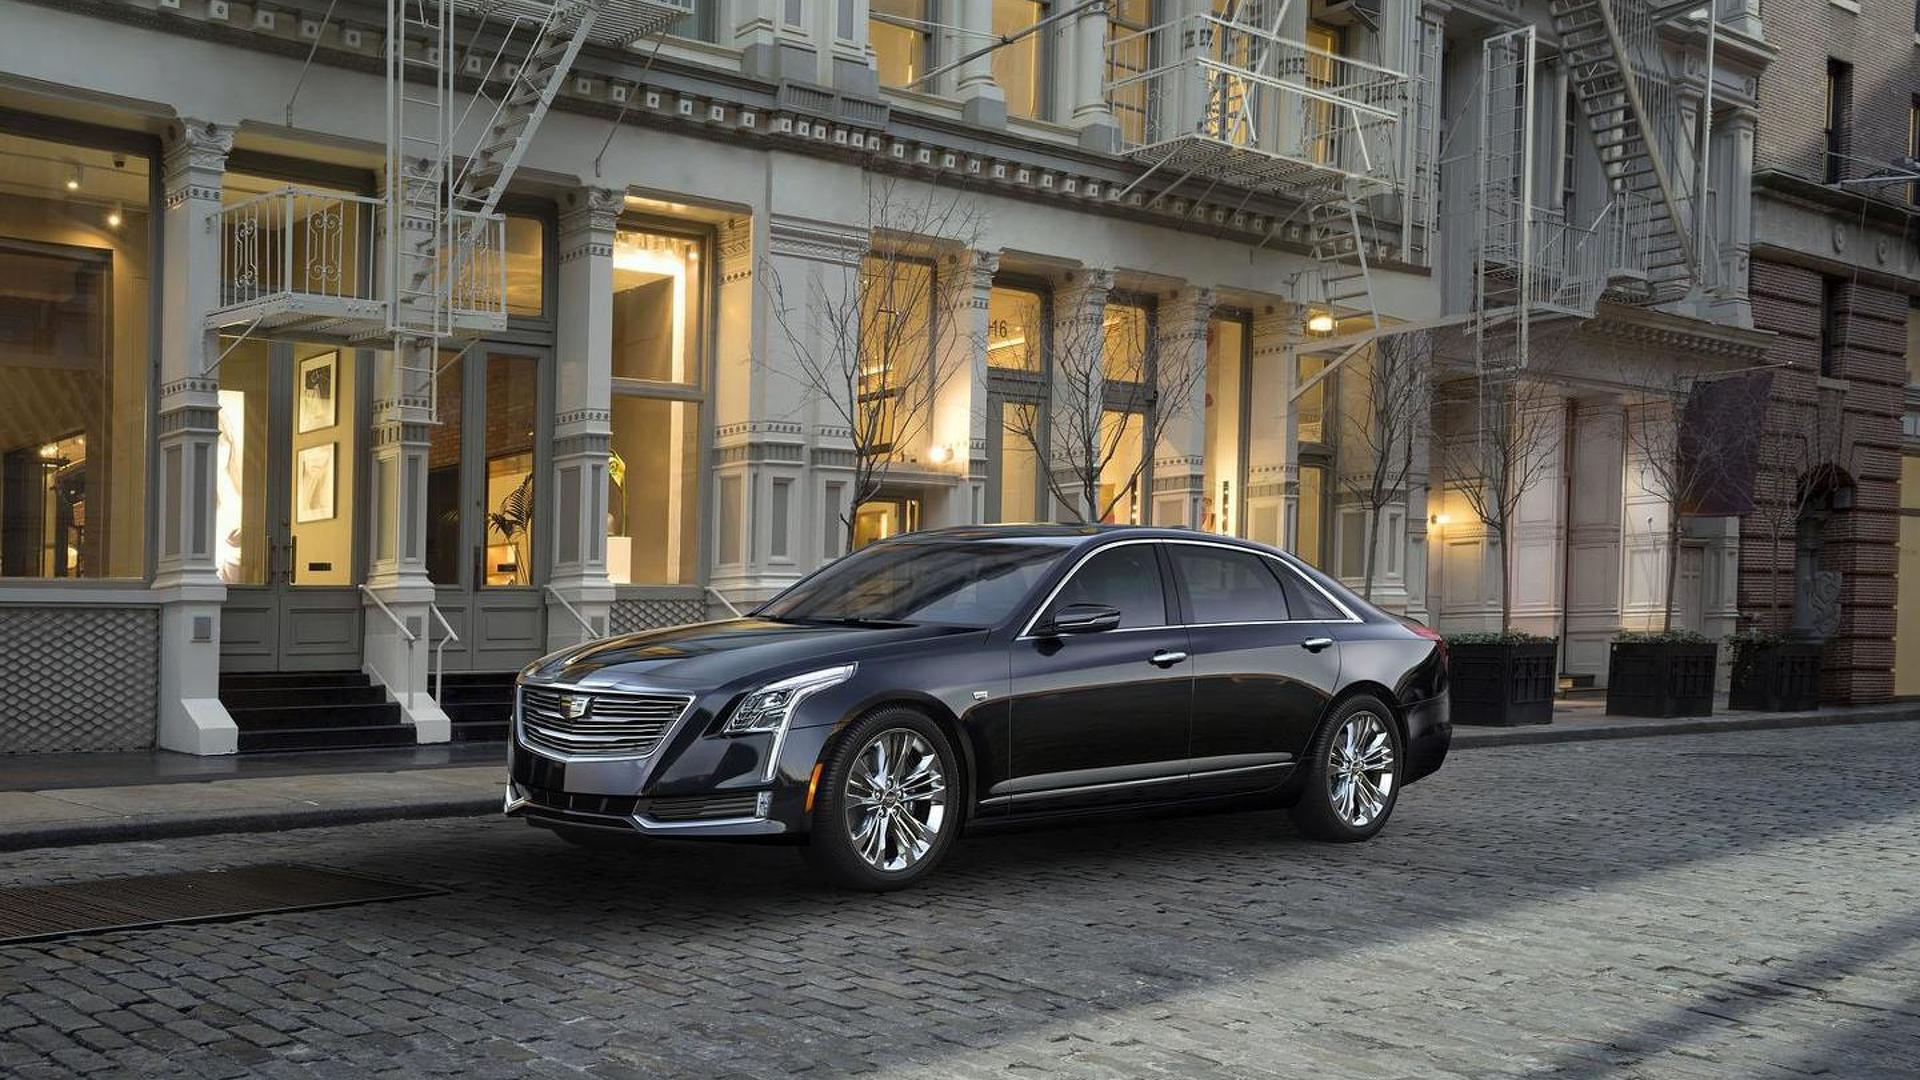 Cadillac CT6 slated to gain a biturbo 4.2-liter V8 engine